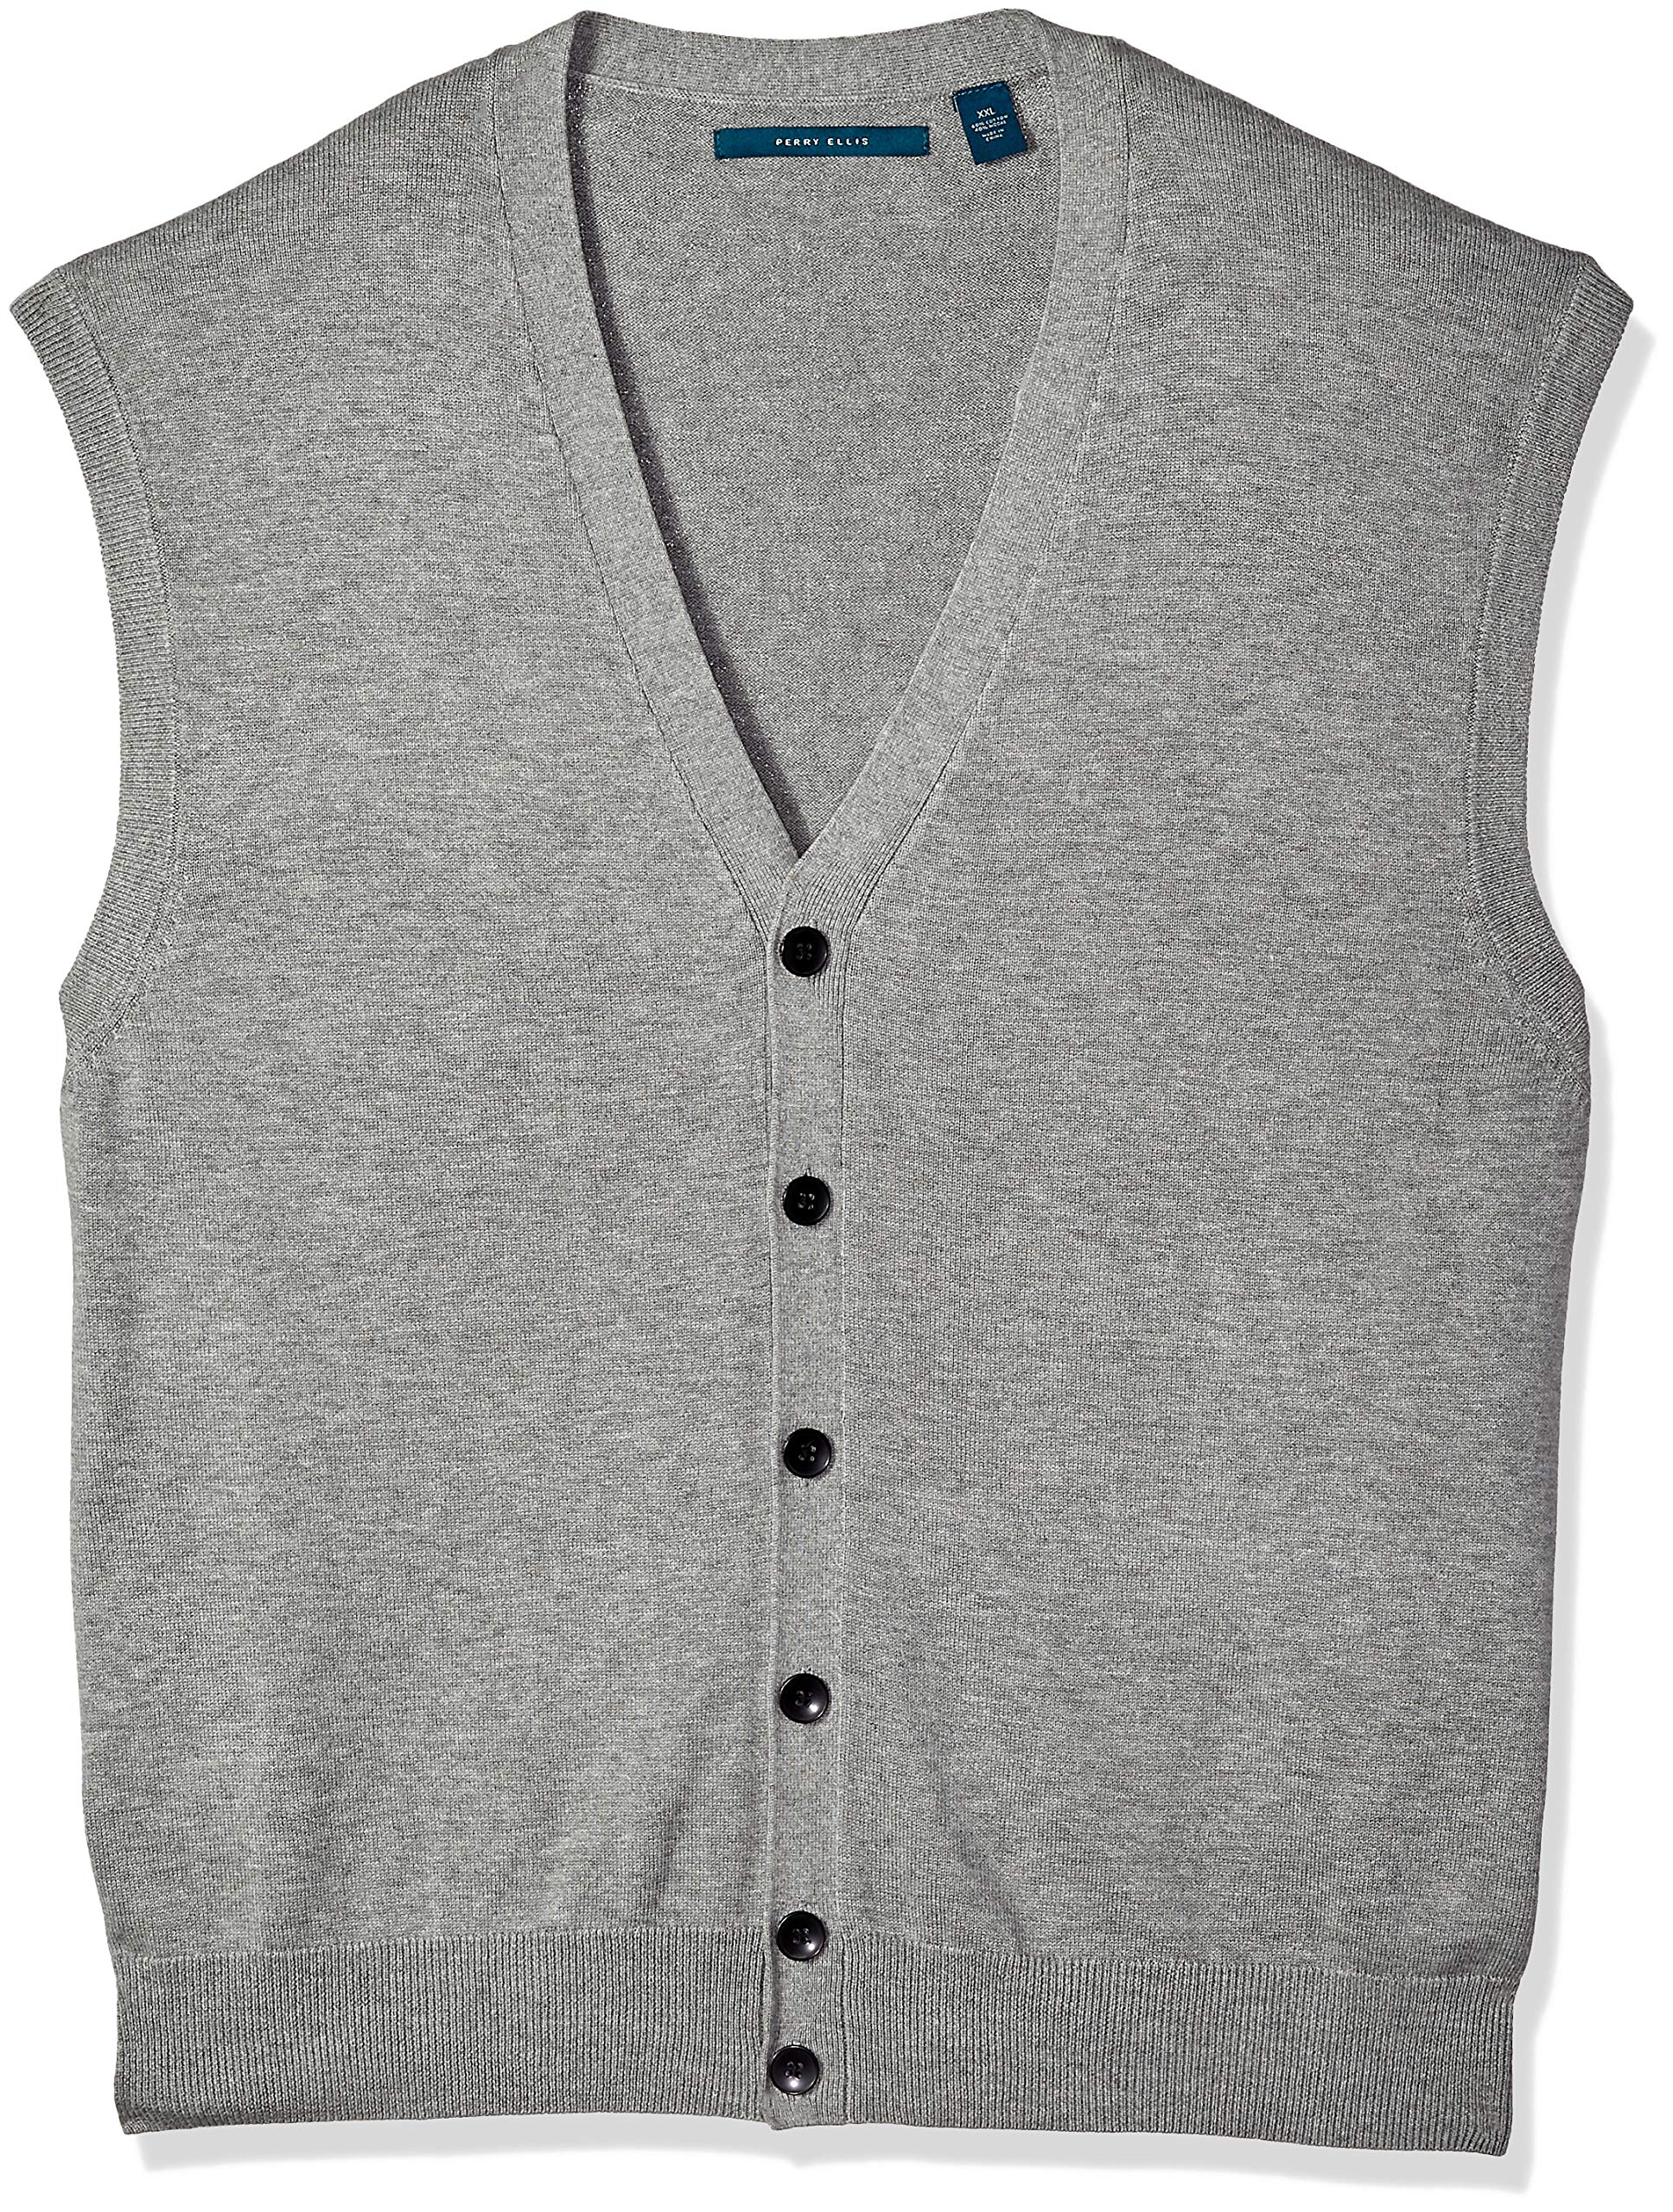 Perry Ellis Men's Jersey Knit Vest, Smoke Heather/DFG, Medium by Perry Ellis